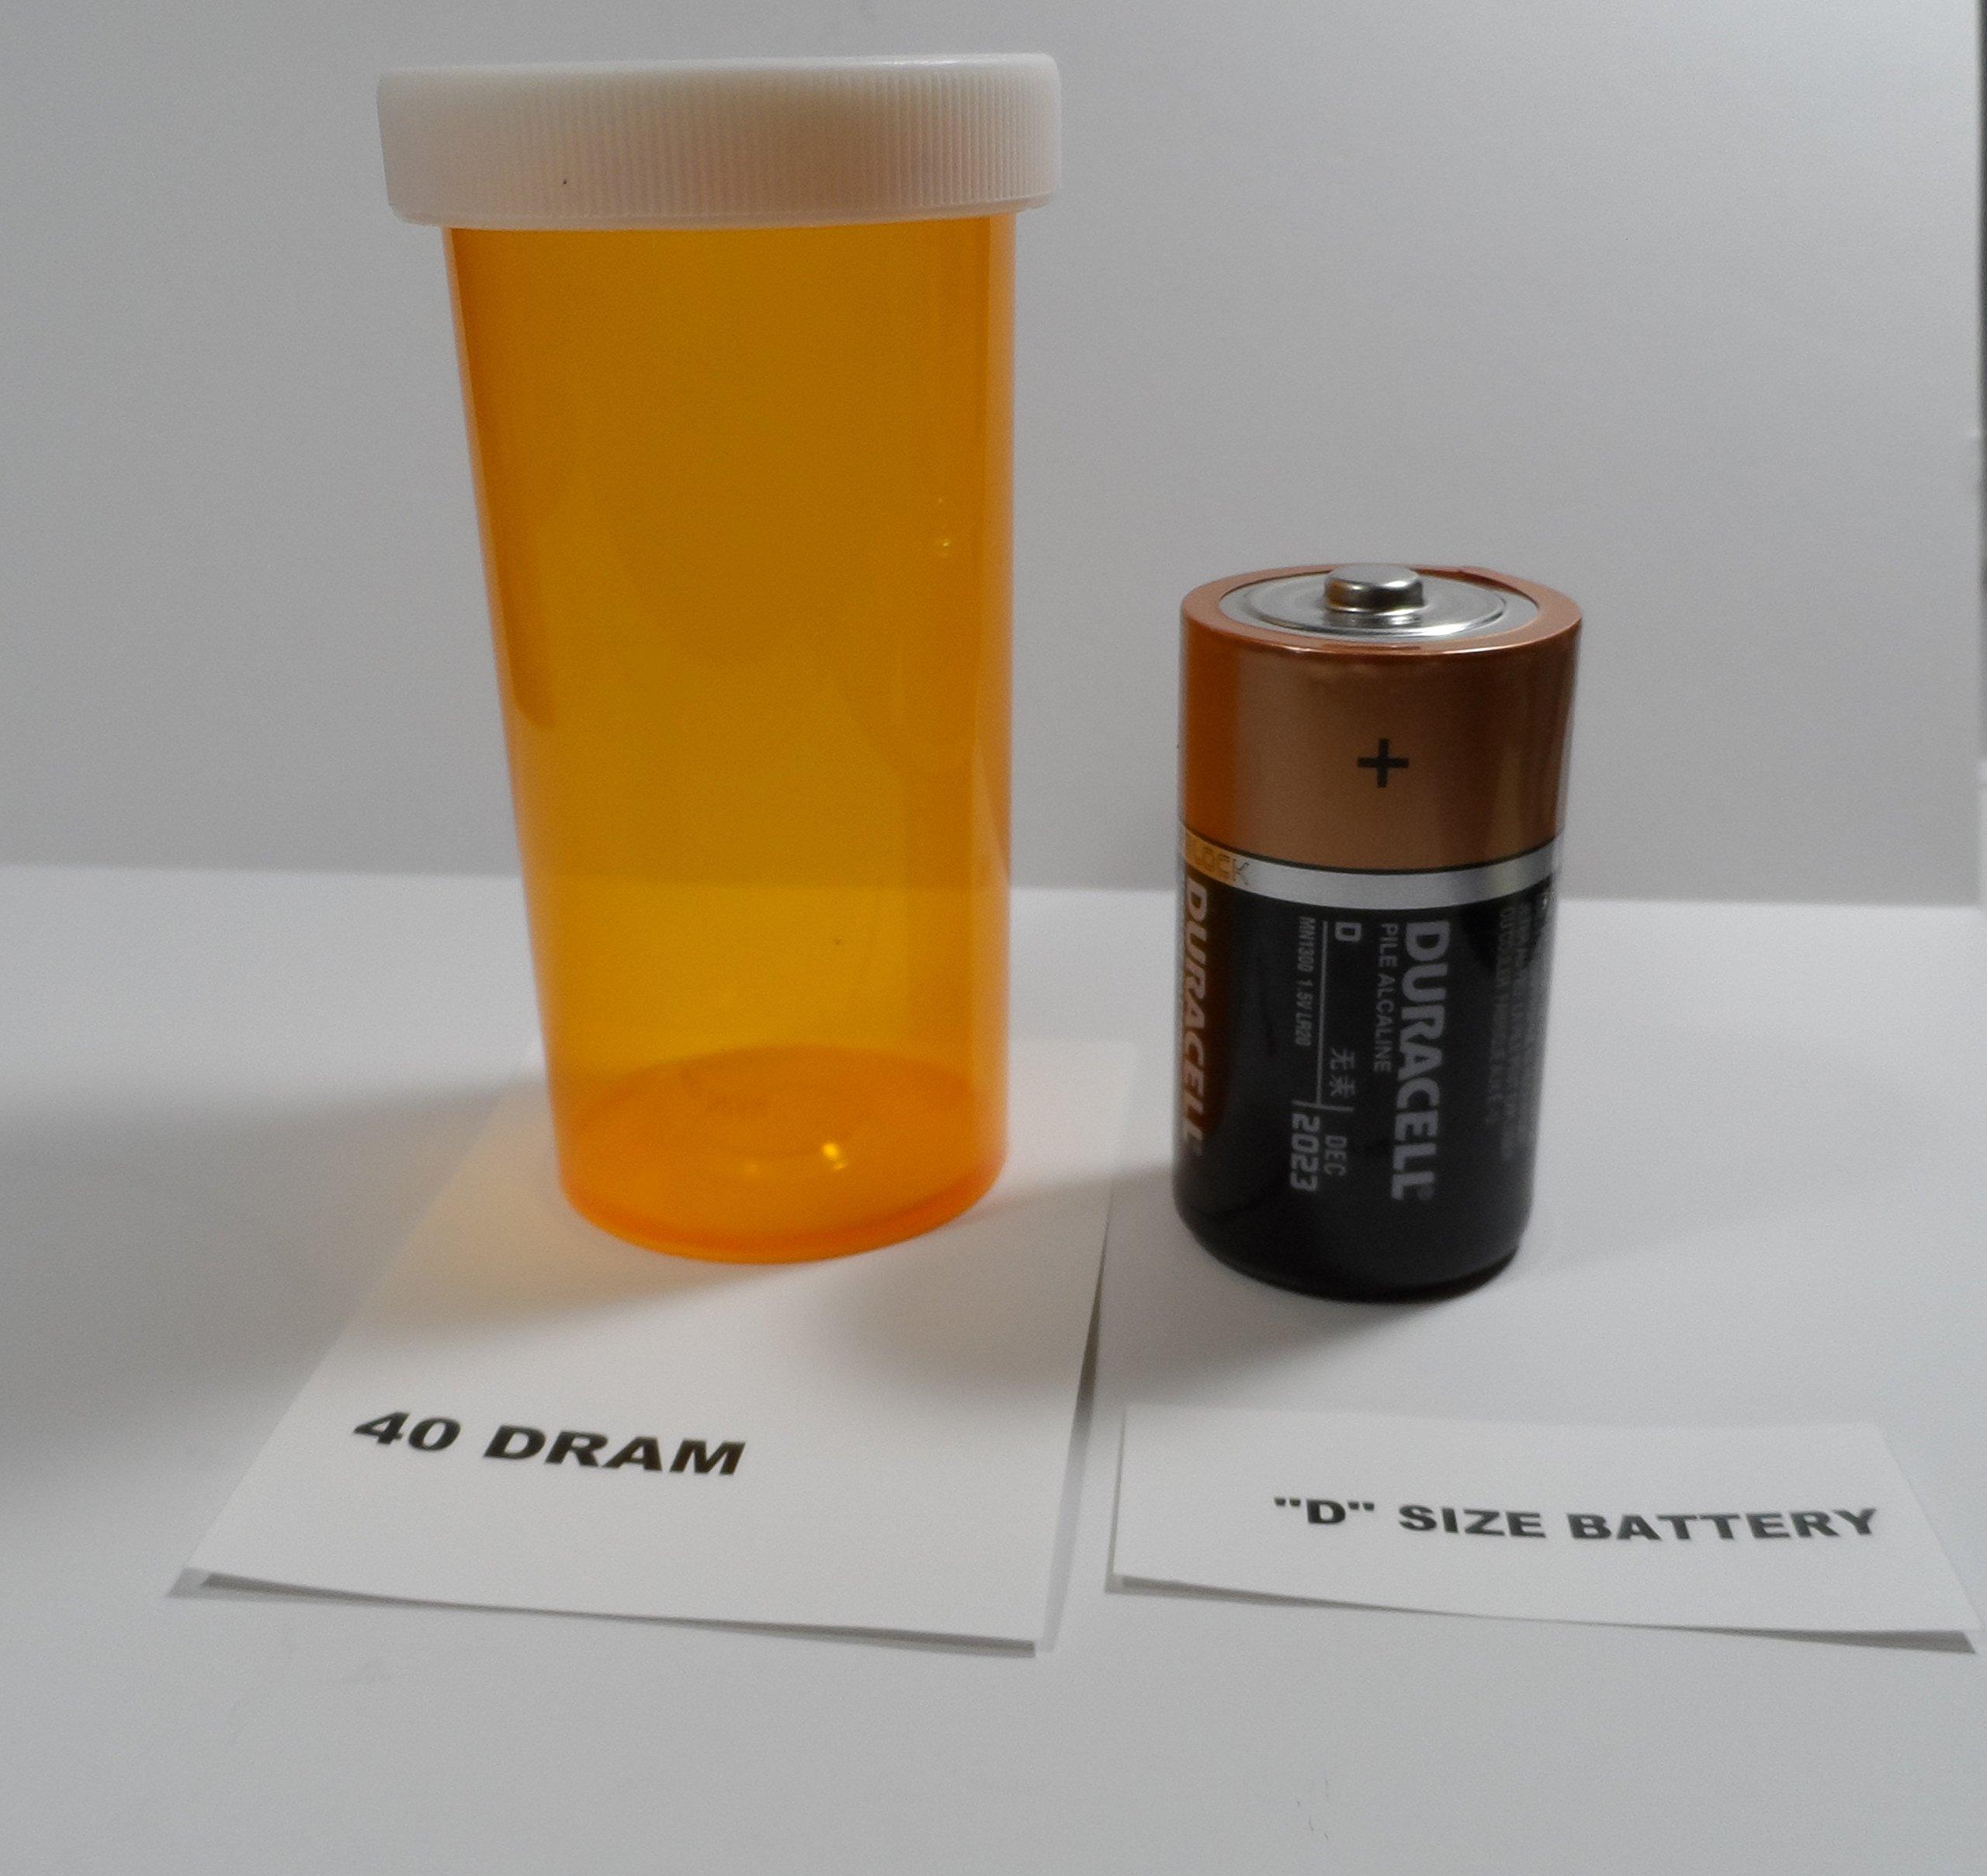 Plastic Prescription Vials/Bottles 25 Pack w/Caps GIANT 40 Dram Size-NEW